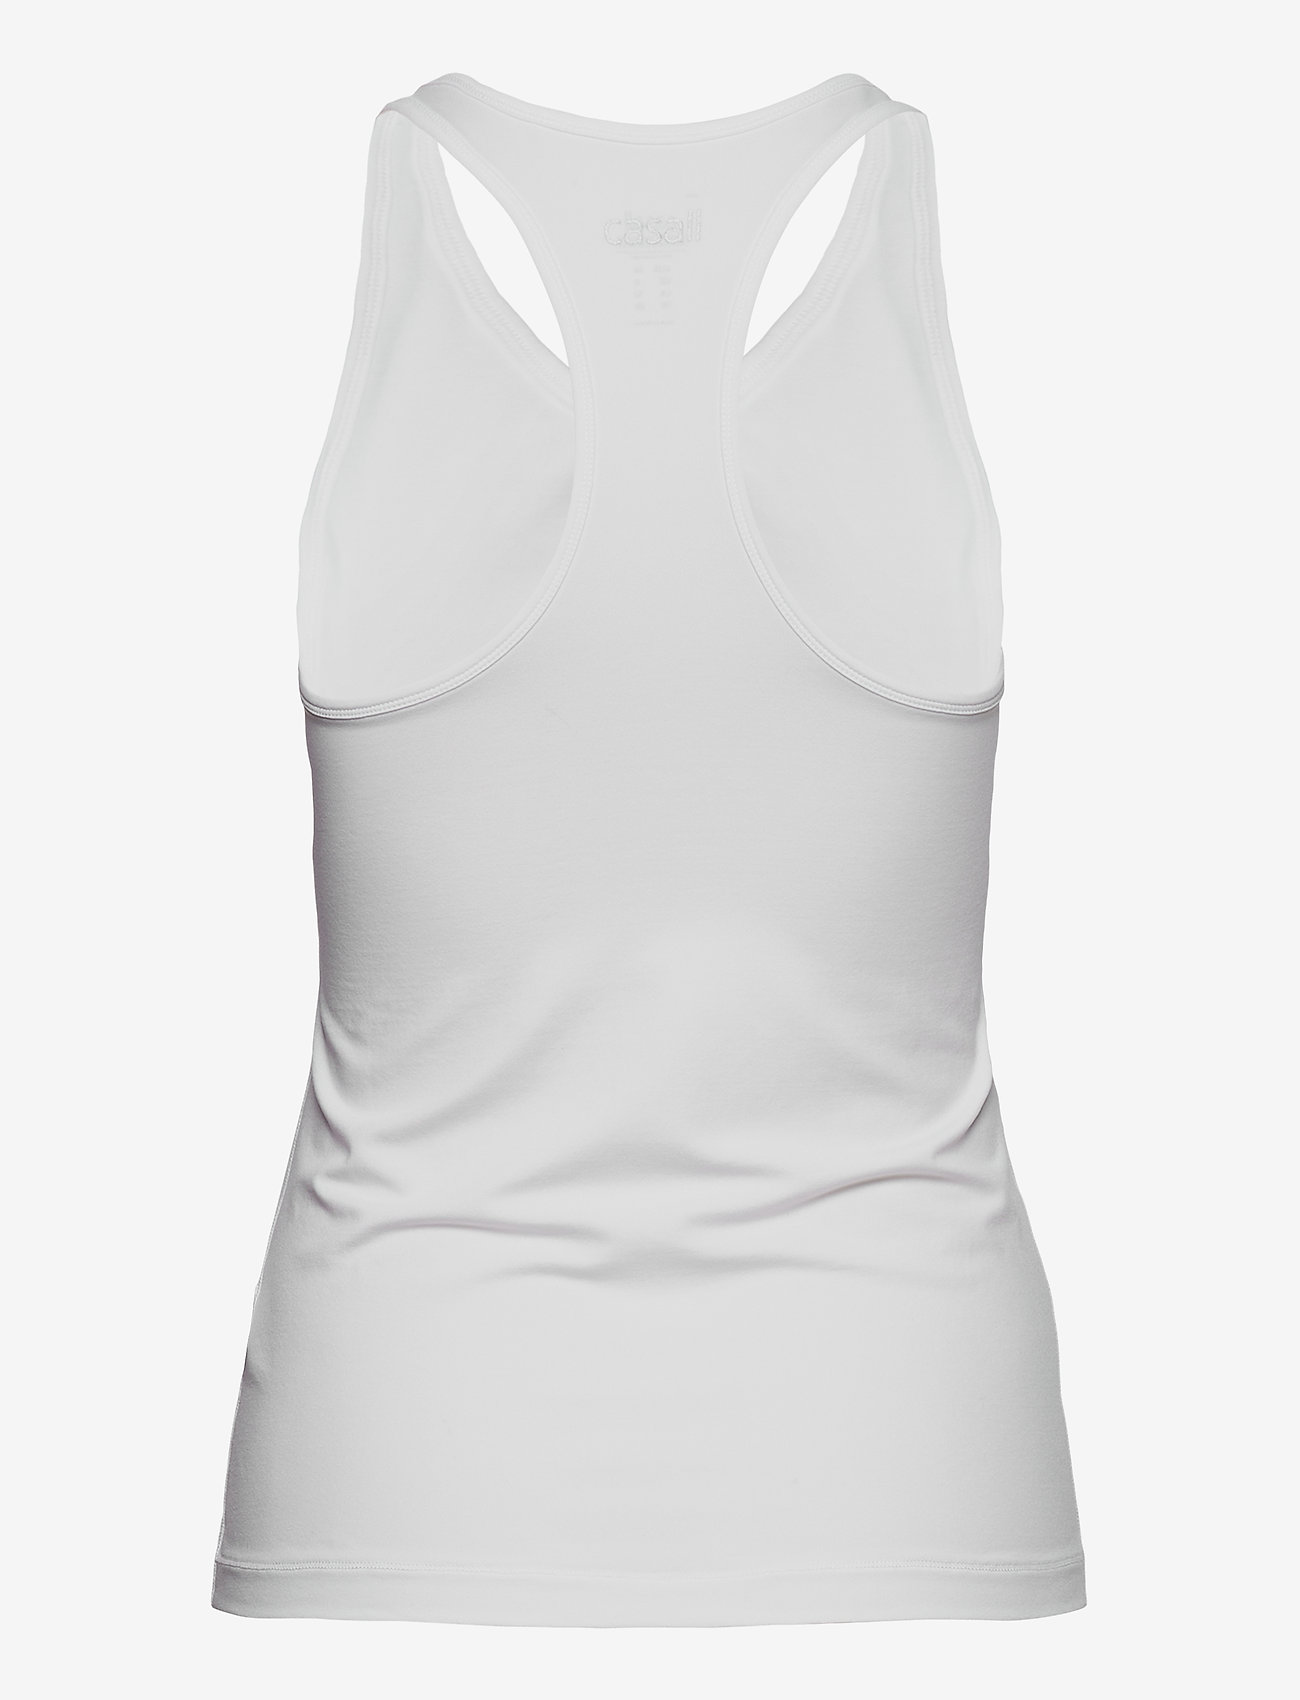 Casall - Essential Racerback - topjes - white - 1